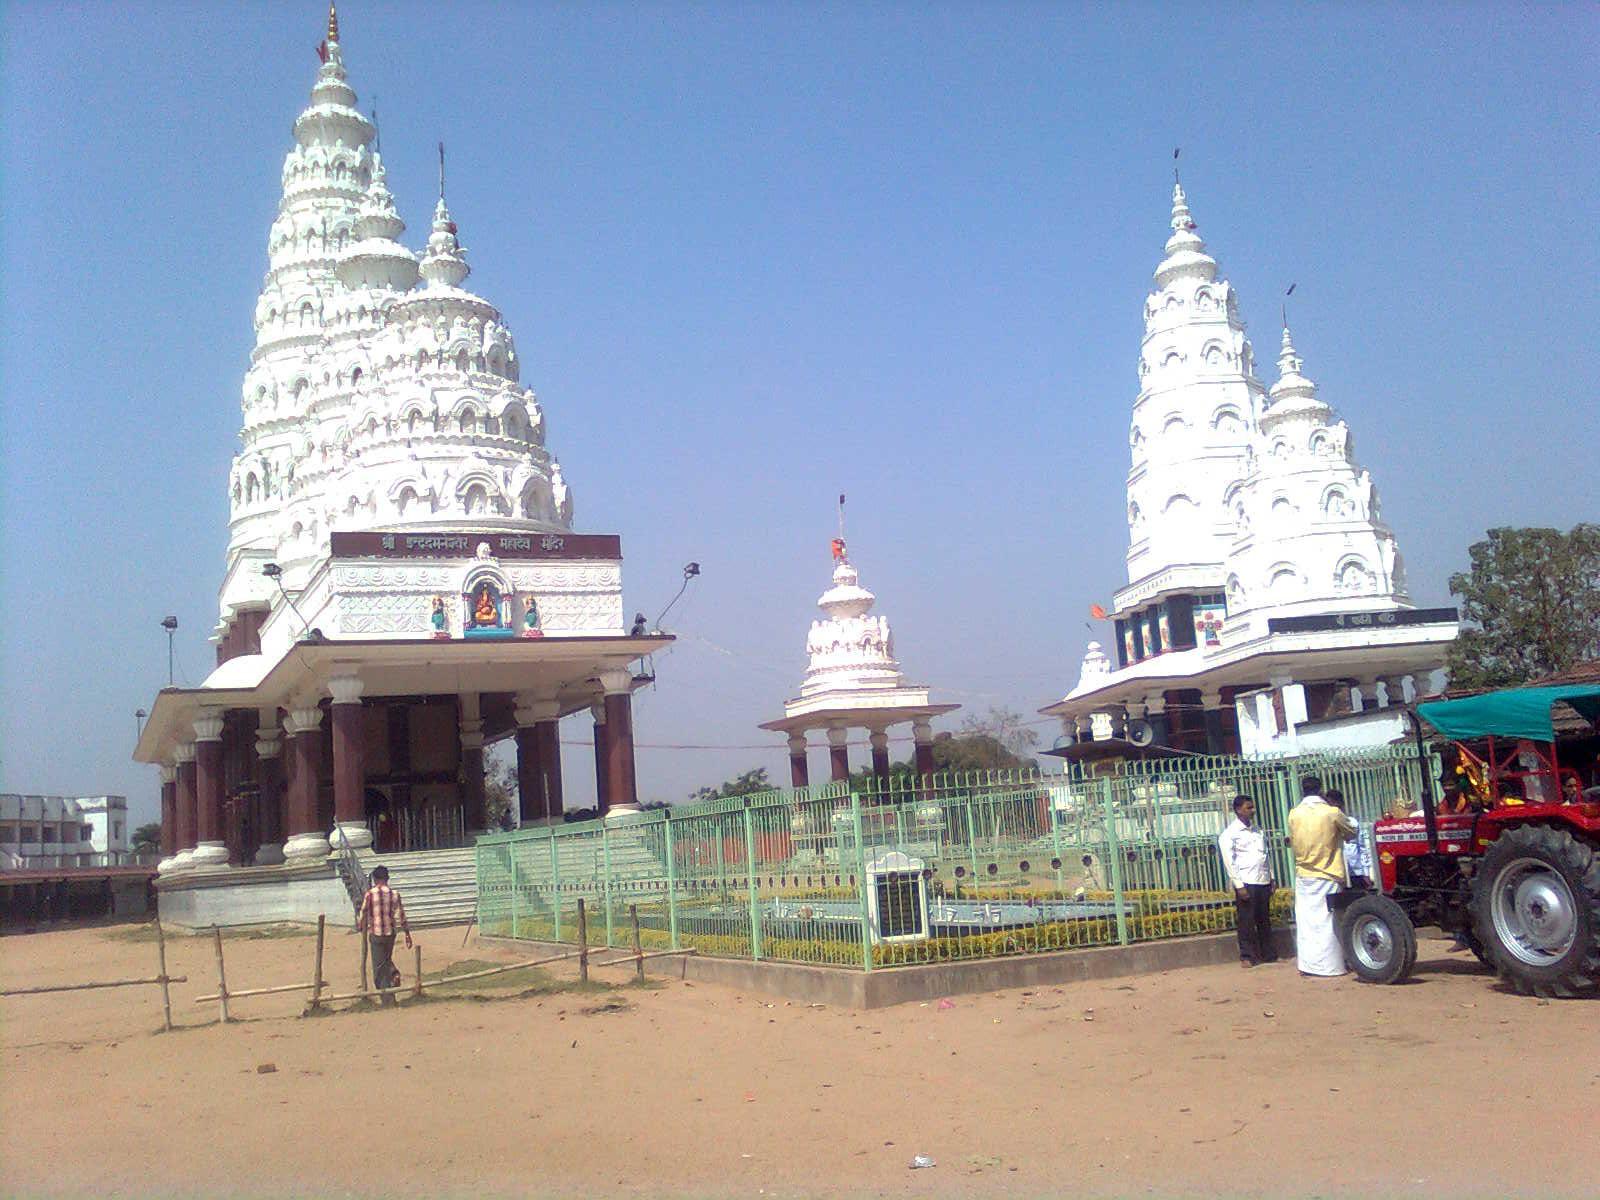 http://www.getbookcab.com/Admin/images/Lakhisarai.jpg